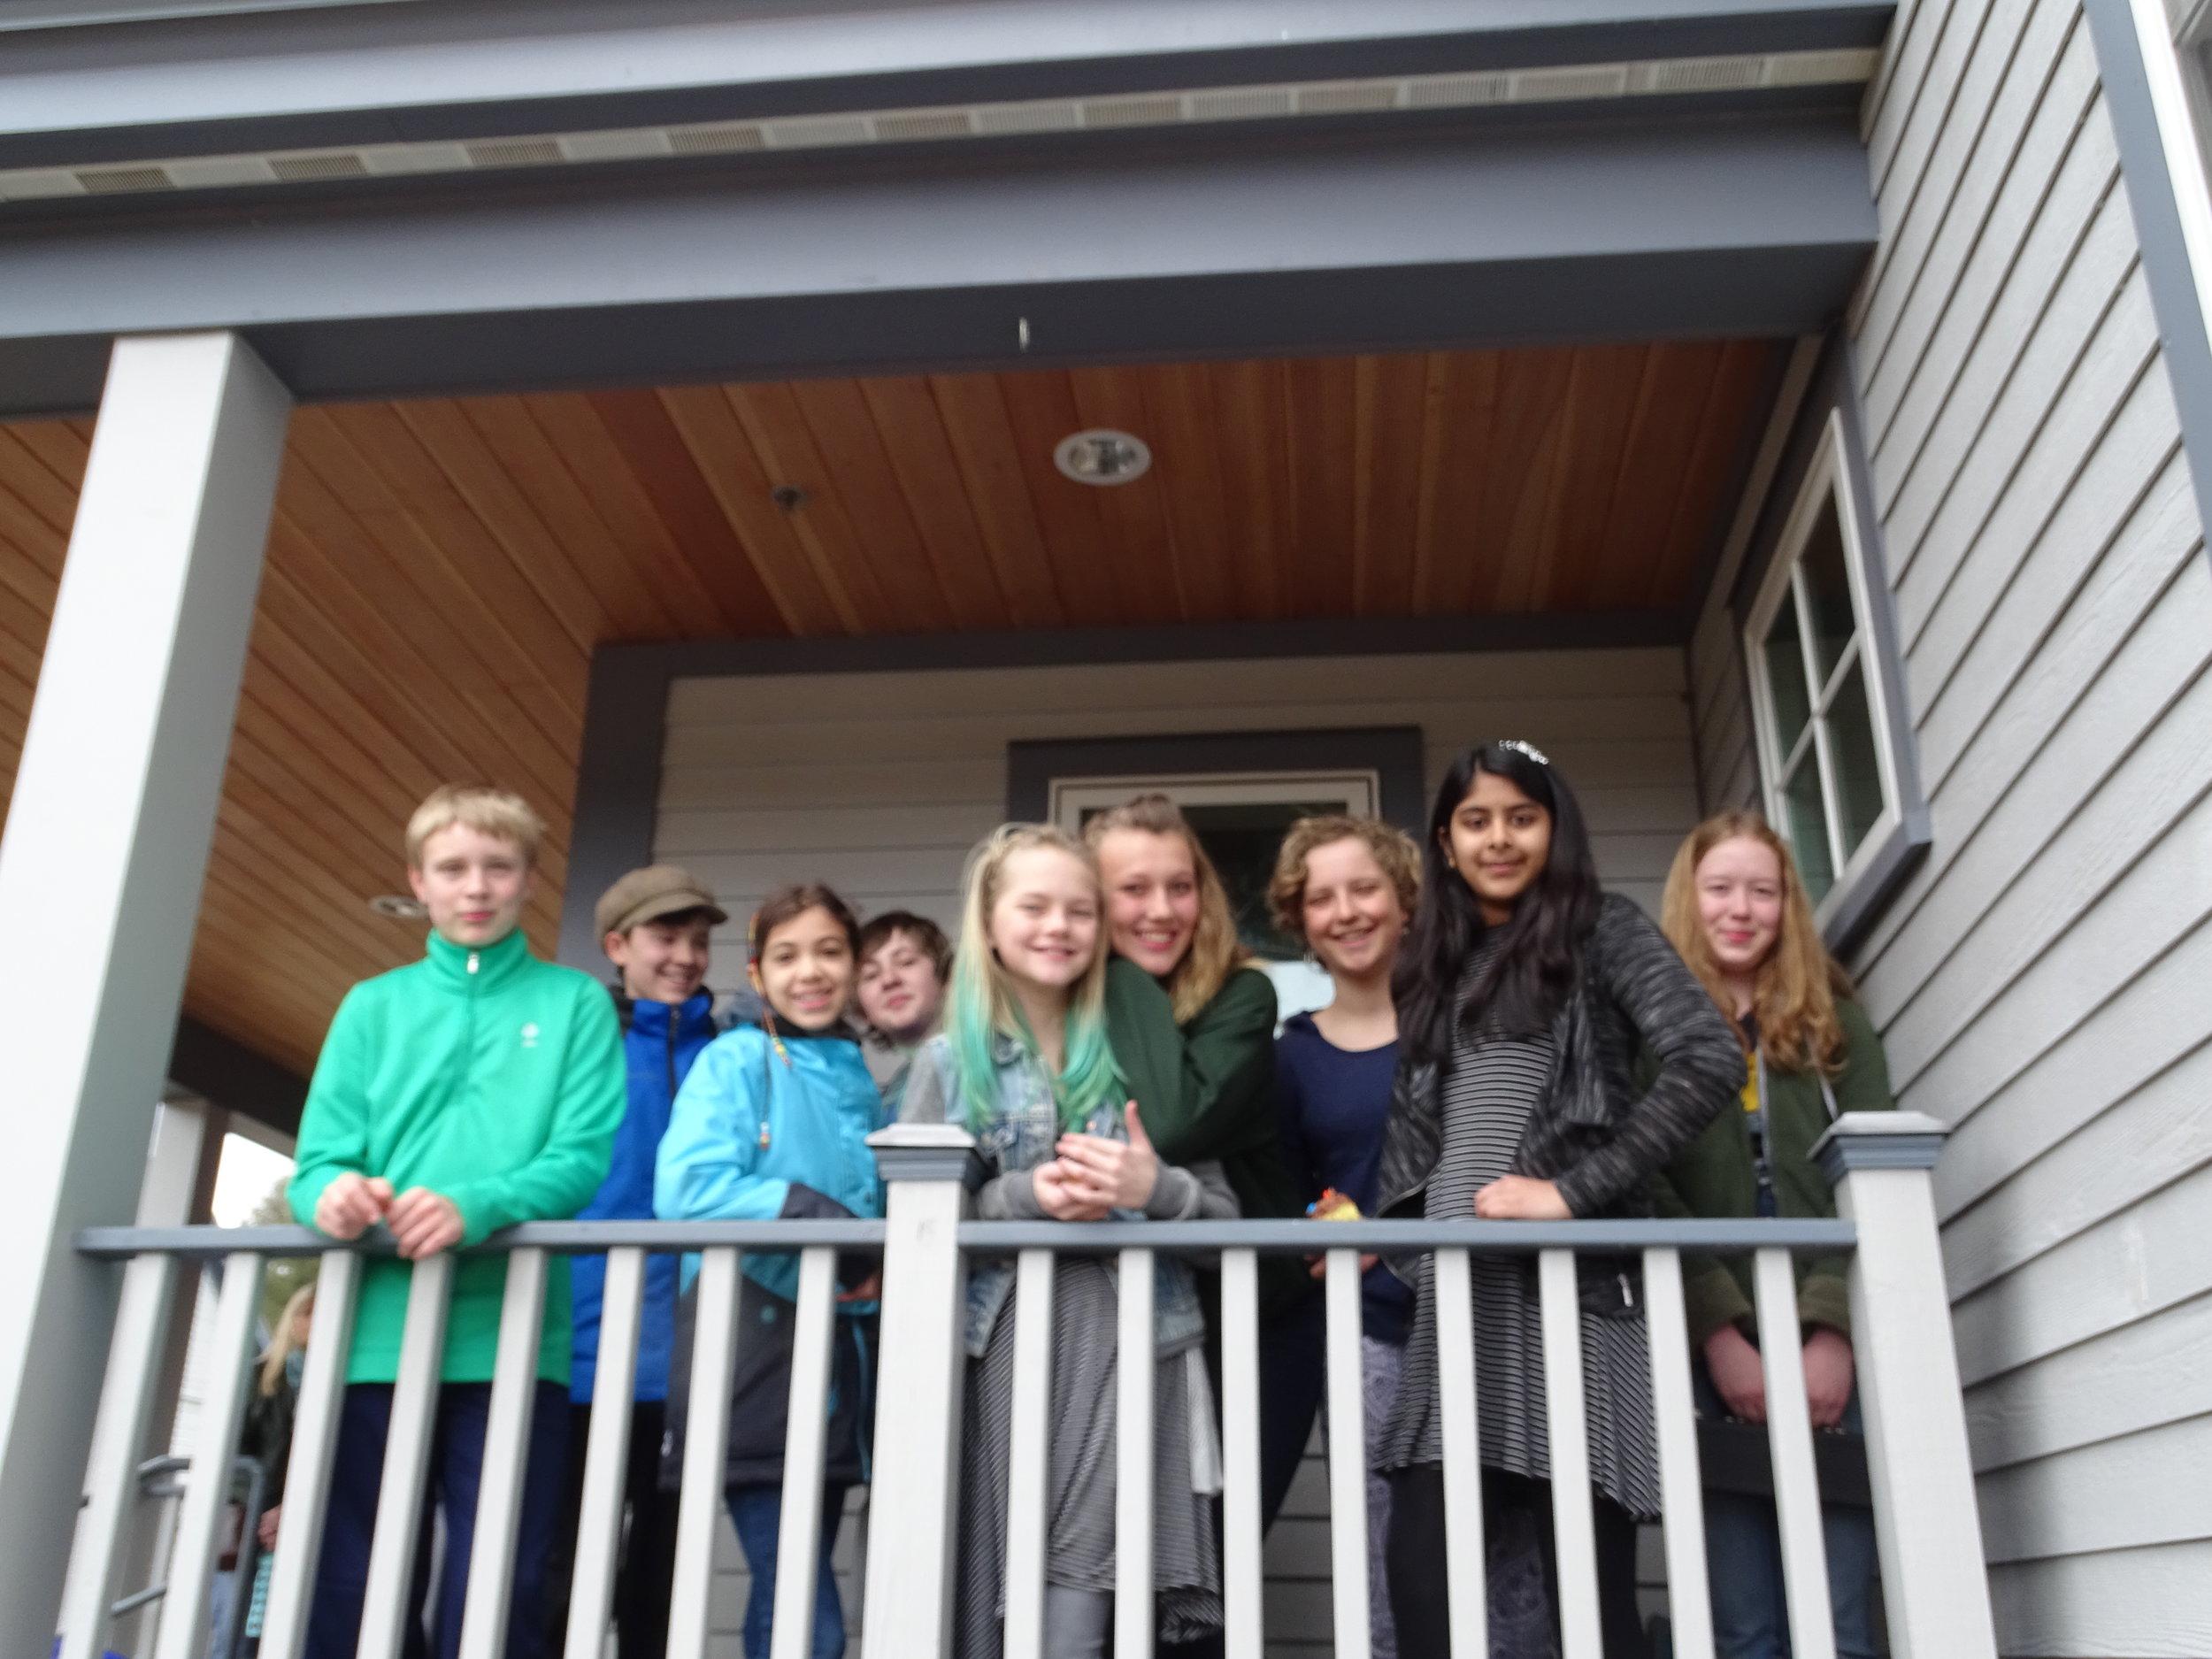 From left to right: Nelson Eaton, Mark Lamontagne, Claire Morgan, John Keenan, Katie Lyon, Ruby Yerkes, Waverly Griffin, Ishida Patel, Meredith ()